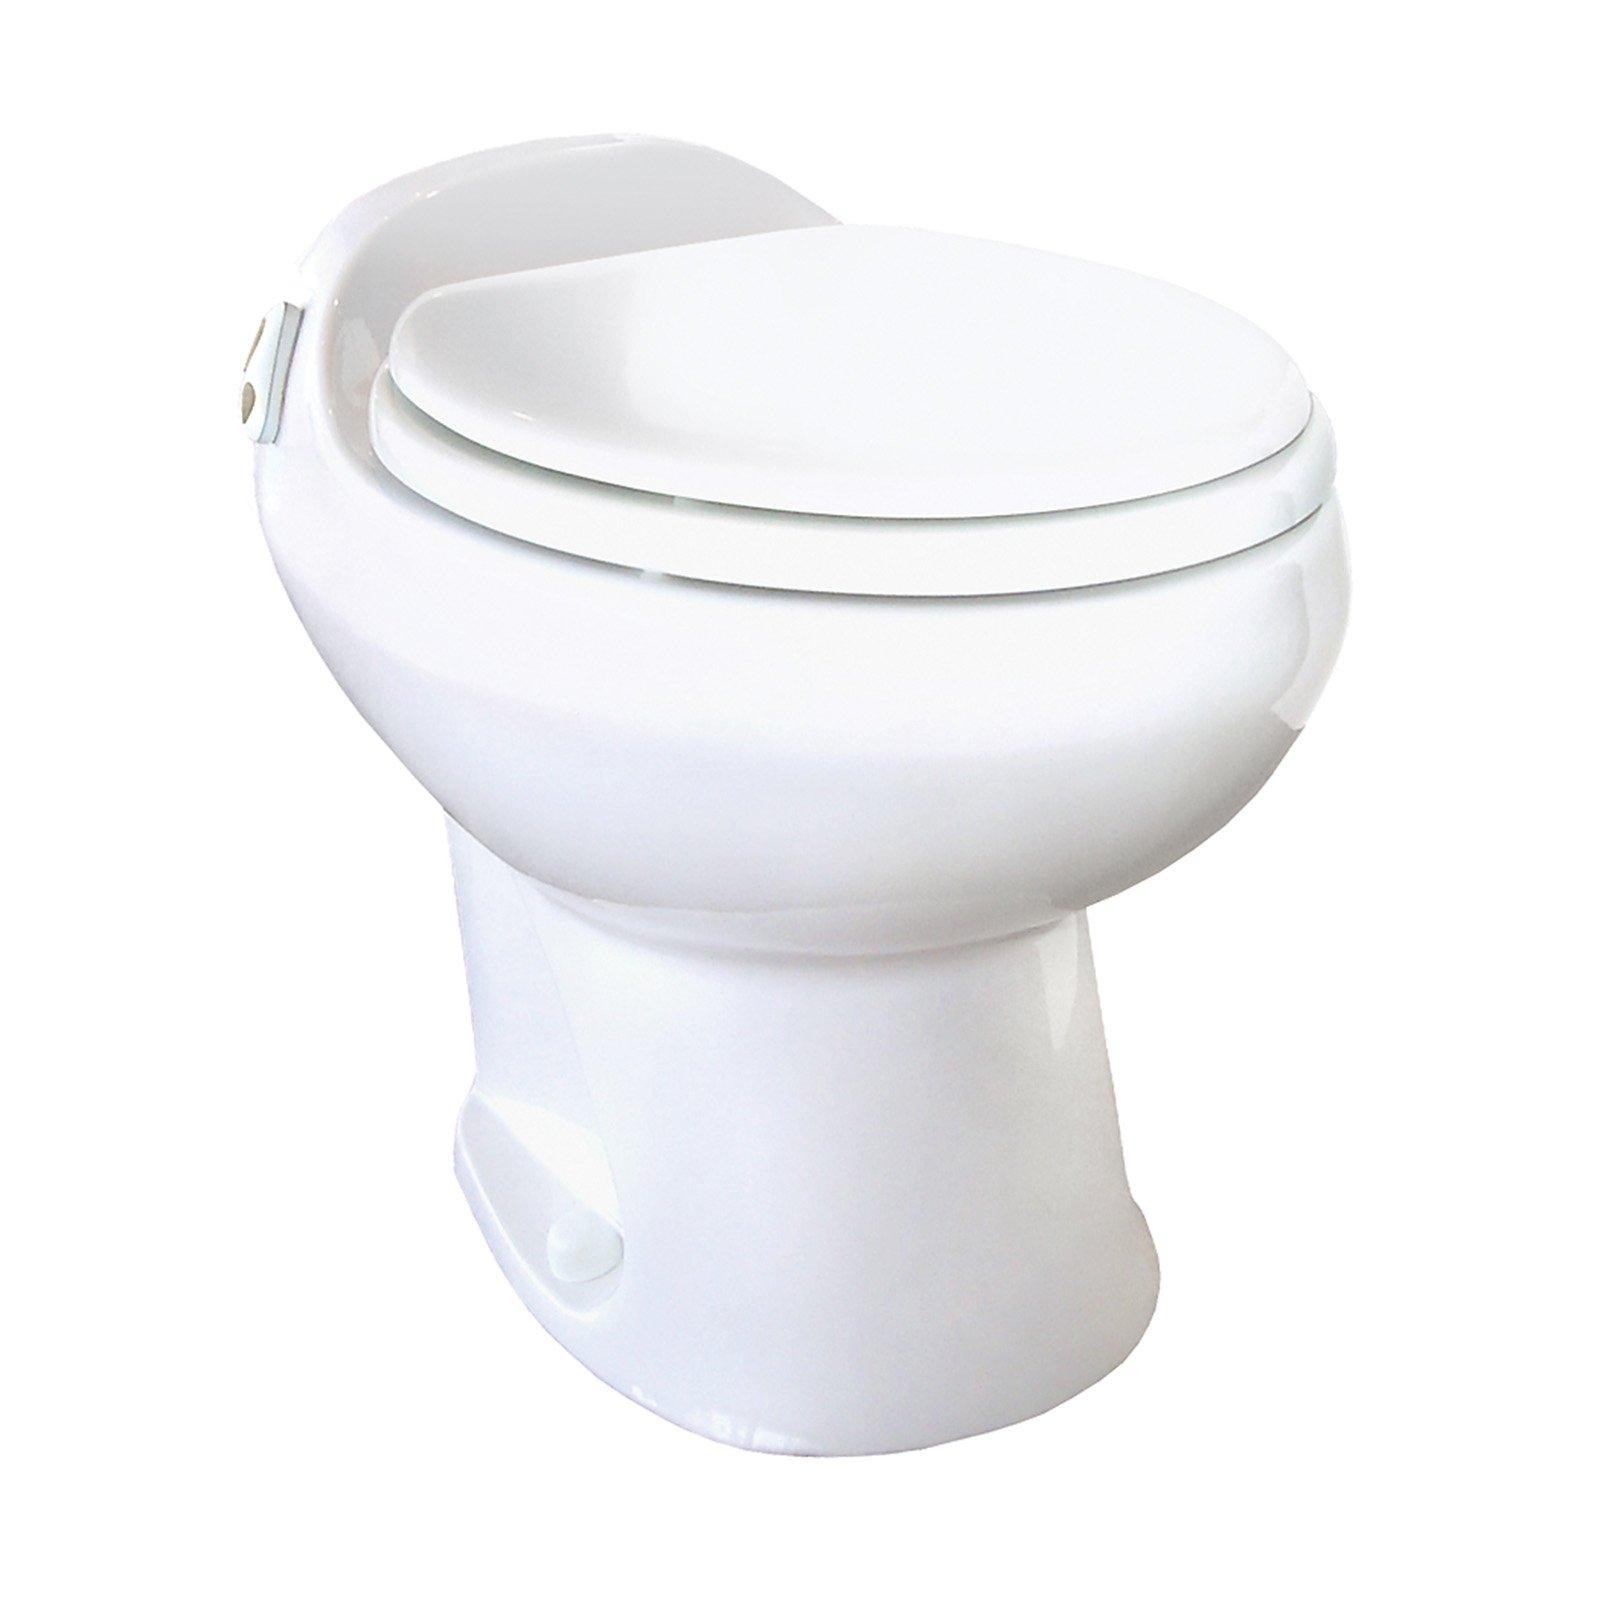 Thetford 19766 RV Toilet Electric Flush by Thetford (Image #1)